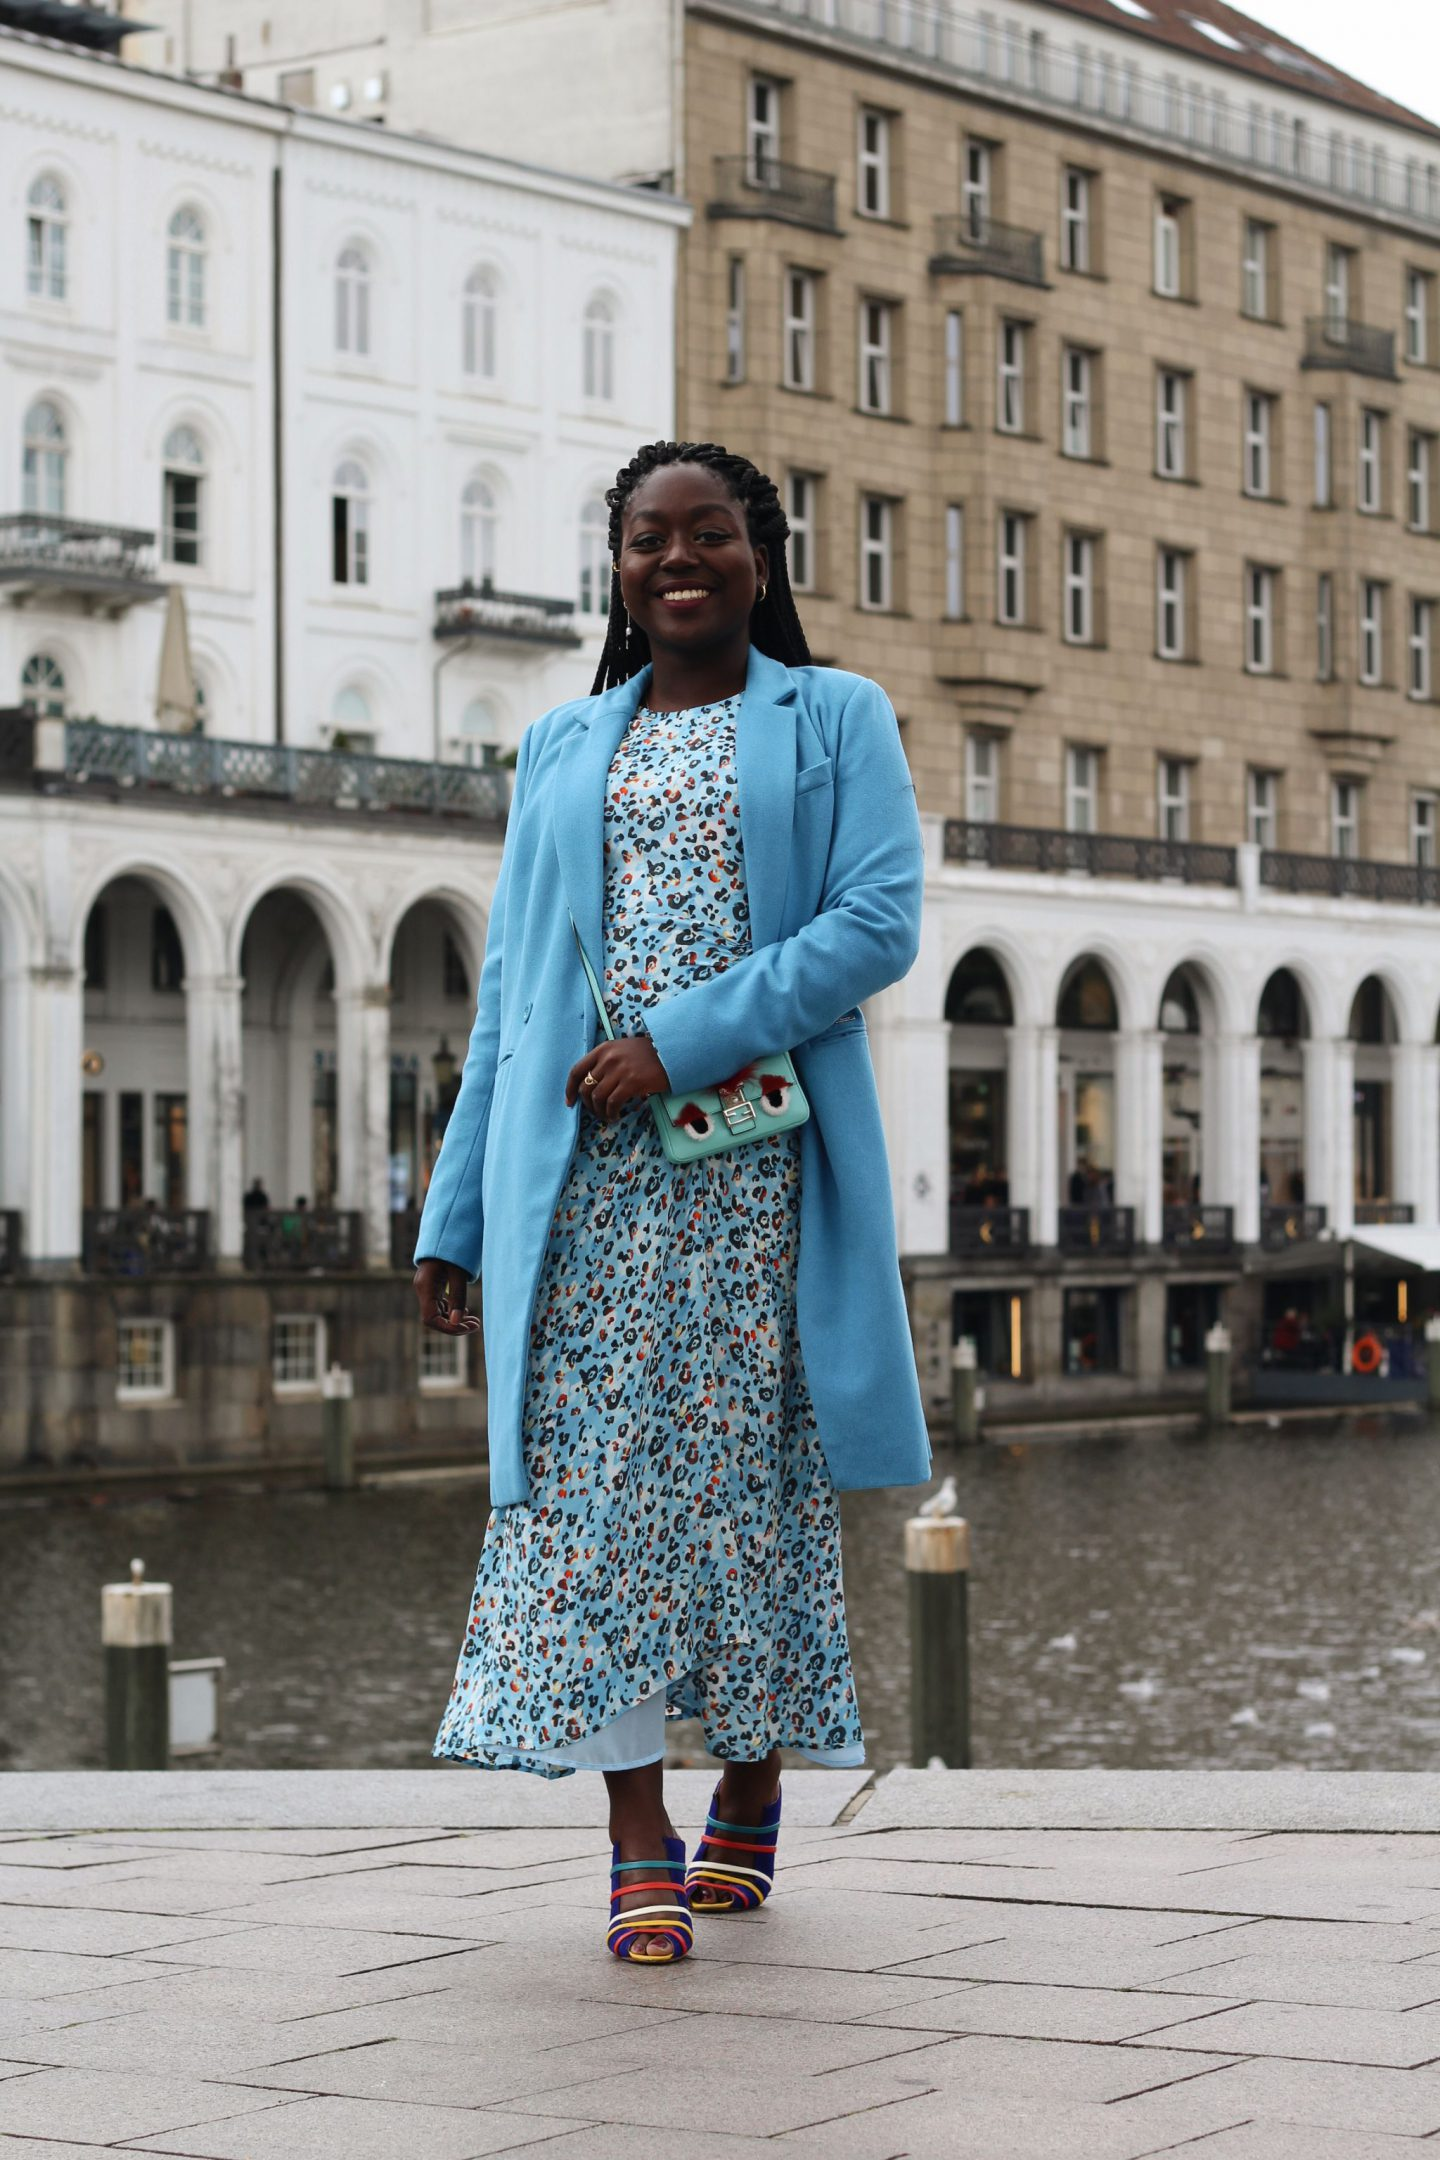 Lala_Berlin_Streetstyle_Lois_Opoku_Fashion_Blogger_Fendi_Monster_Malone_Souliers_lisforlois_9